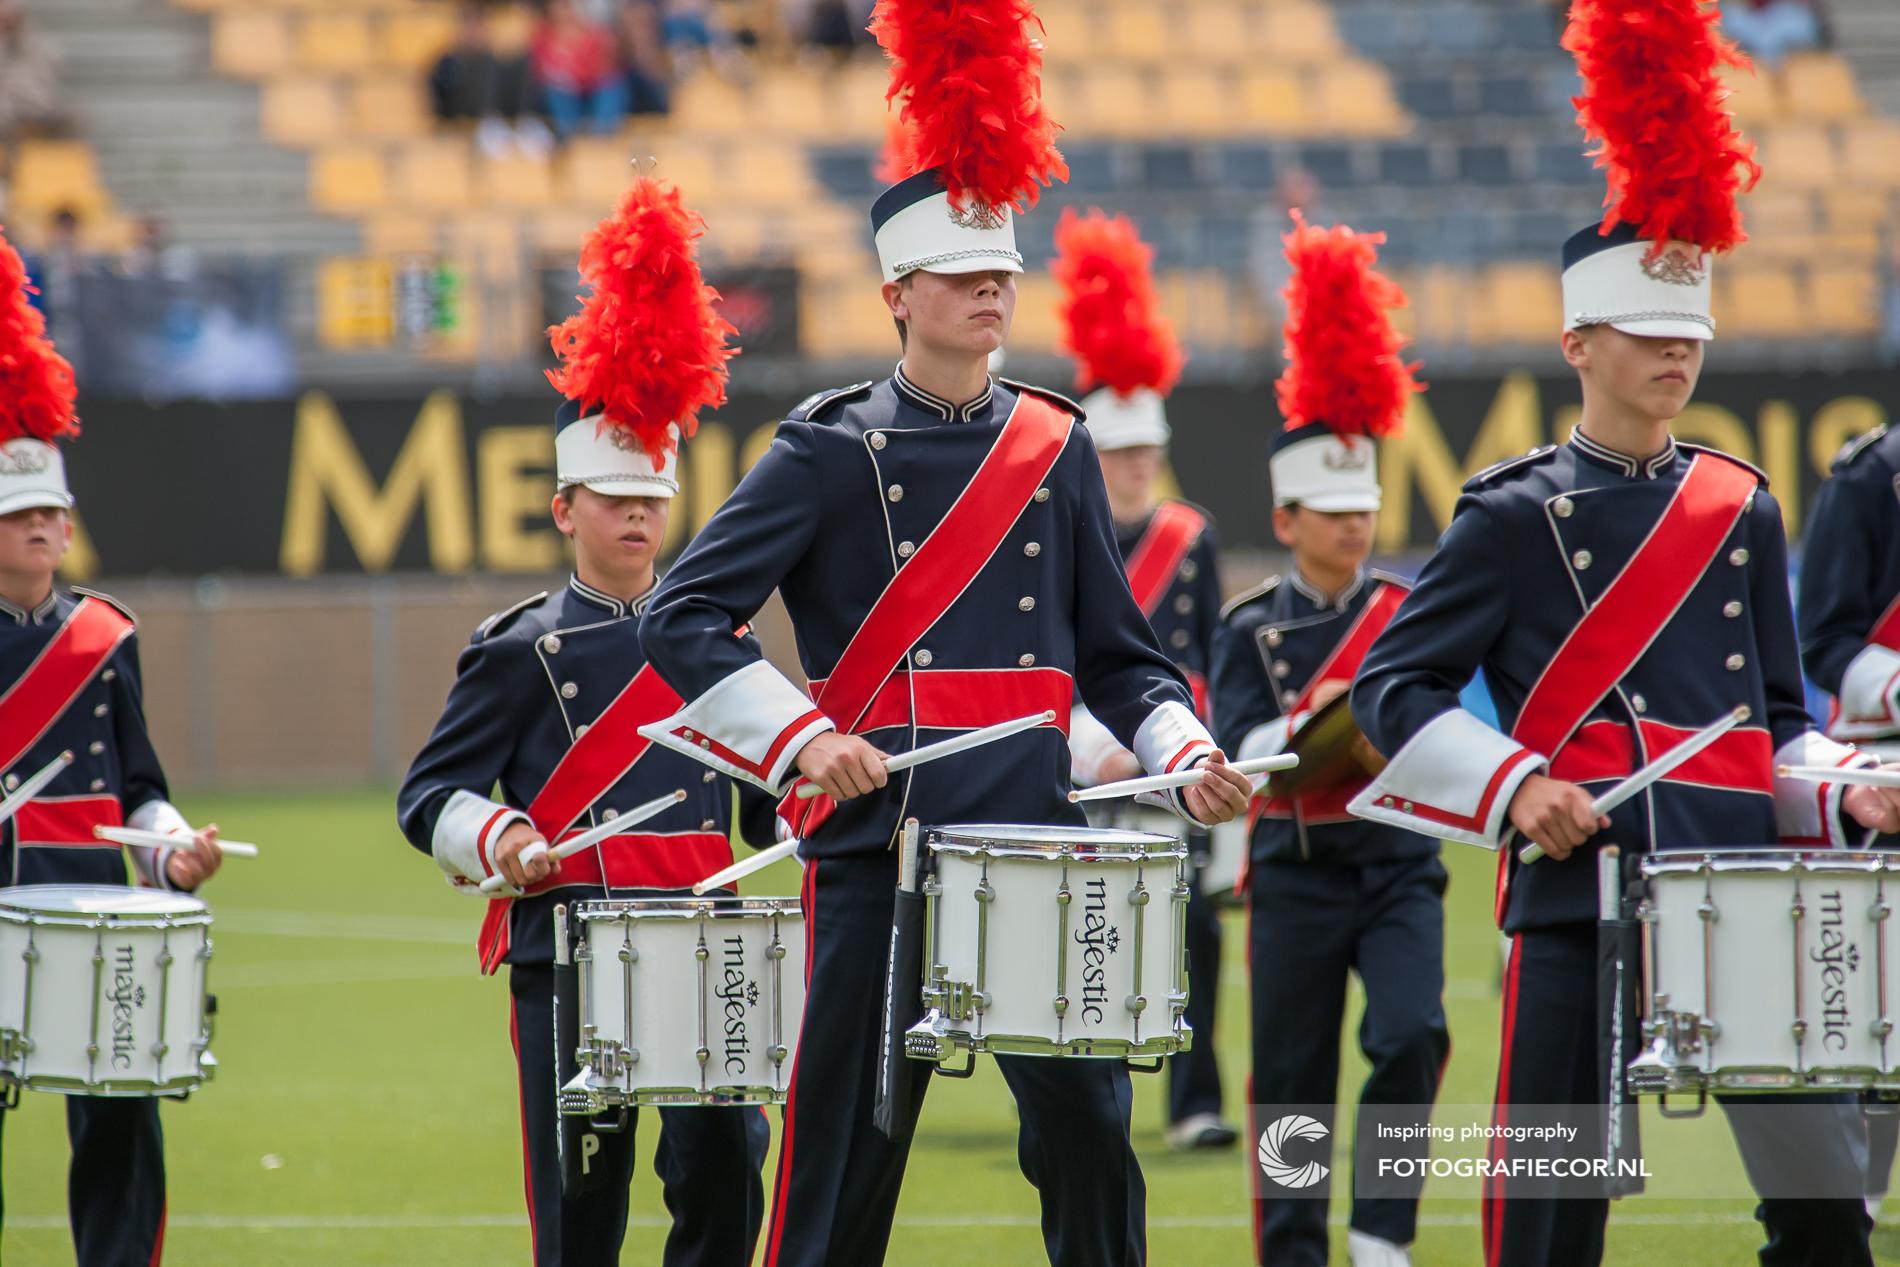 Percussion | WMC | Kerkrade | zilver | KTK | Kampen | concours | wereld | muziek | event | fotografie